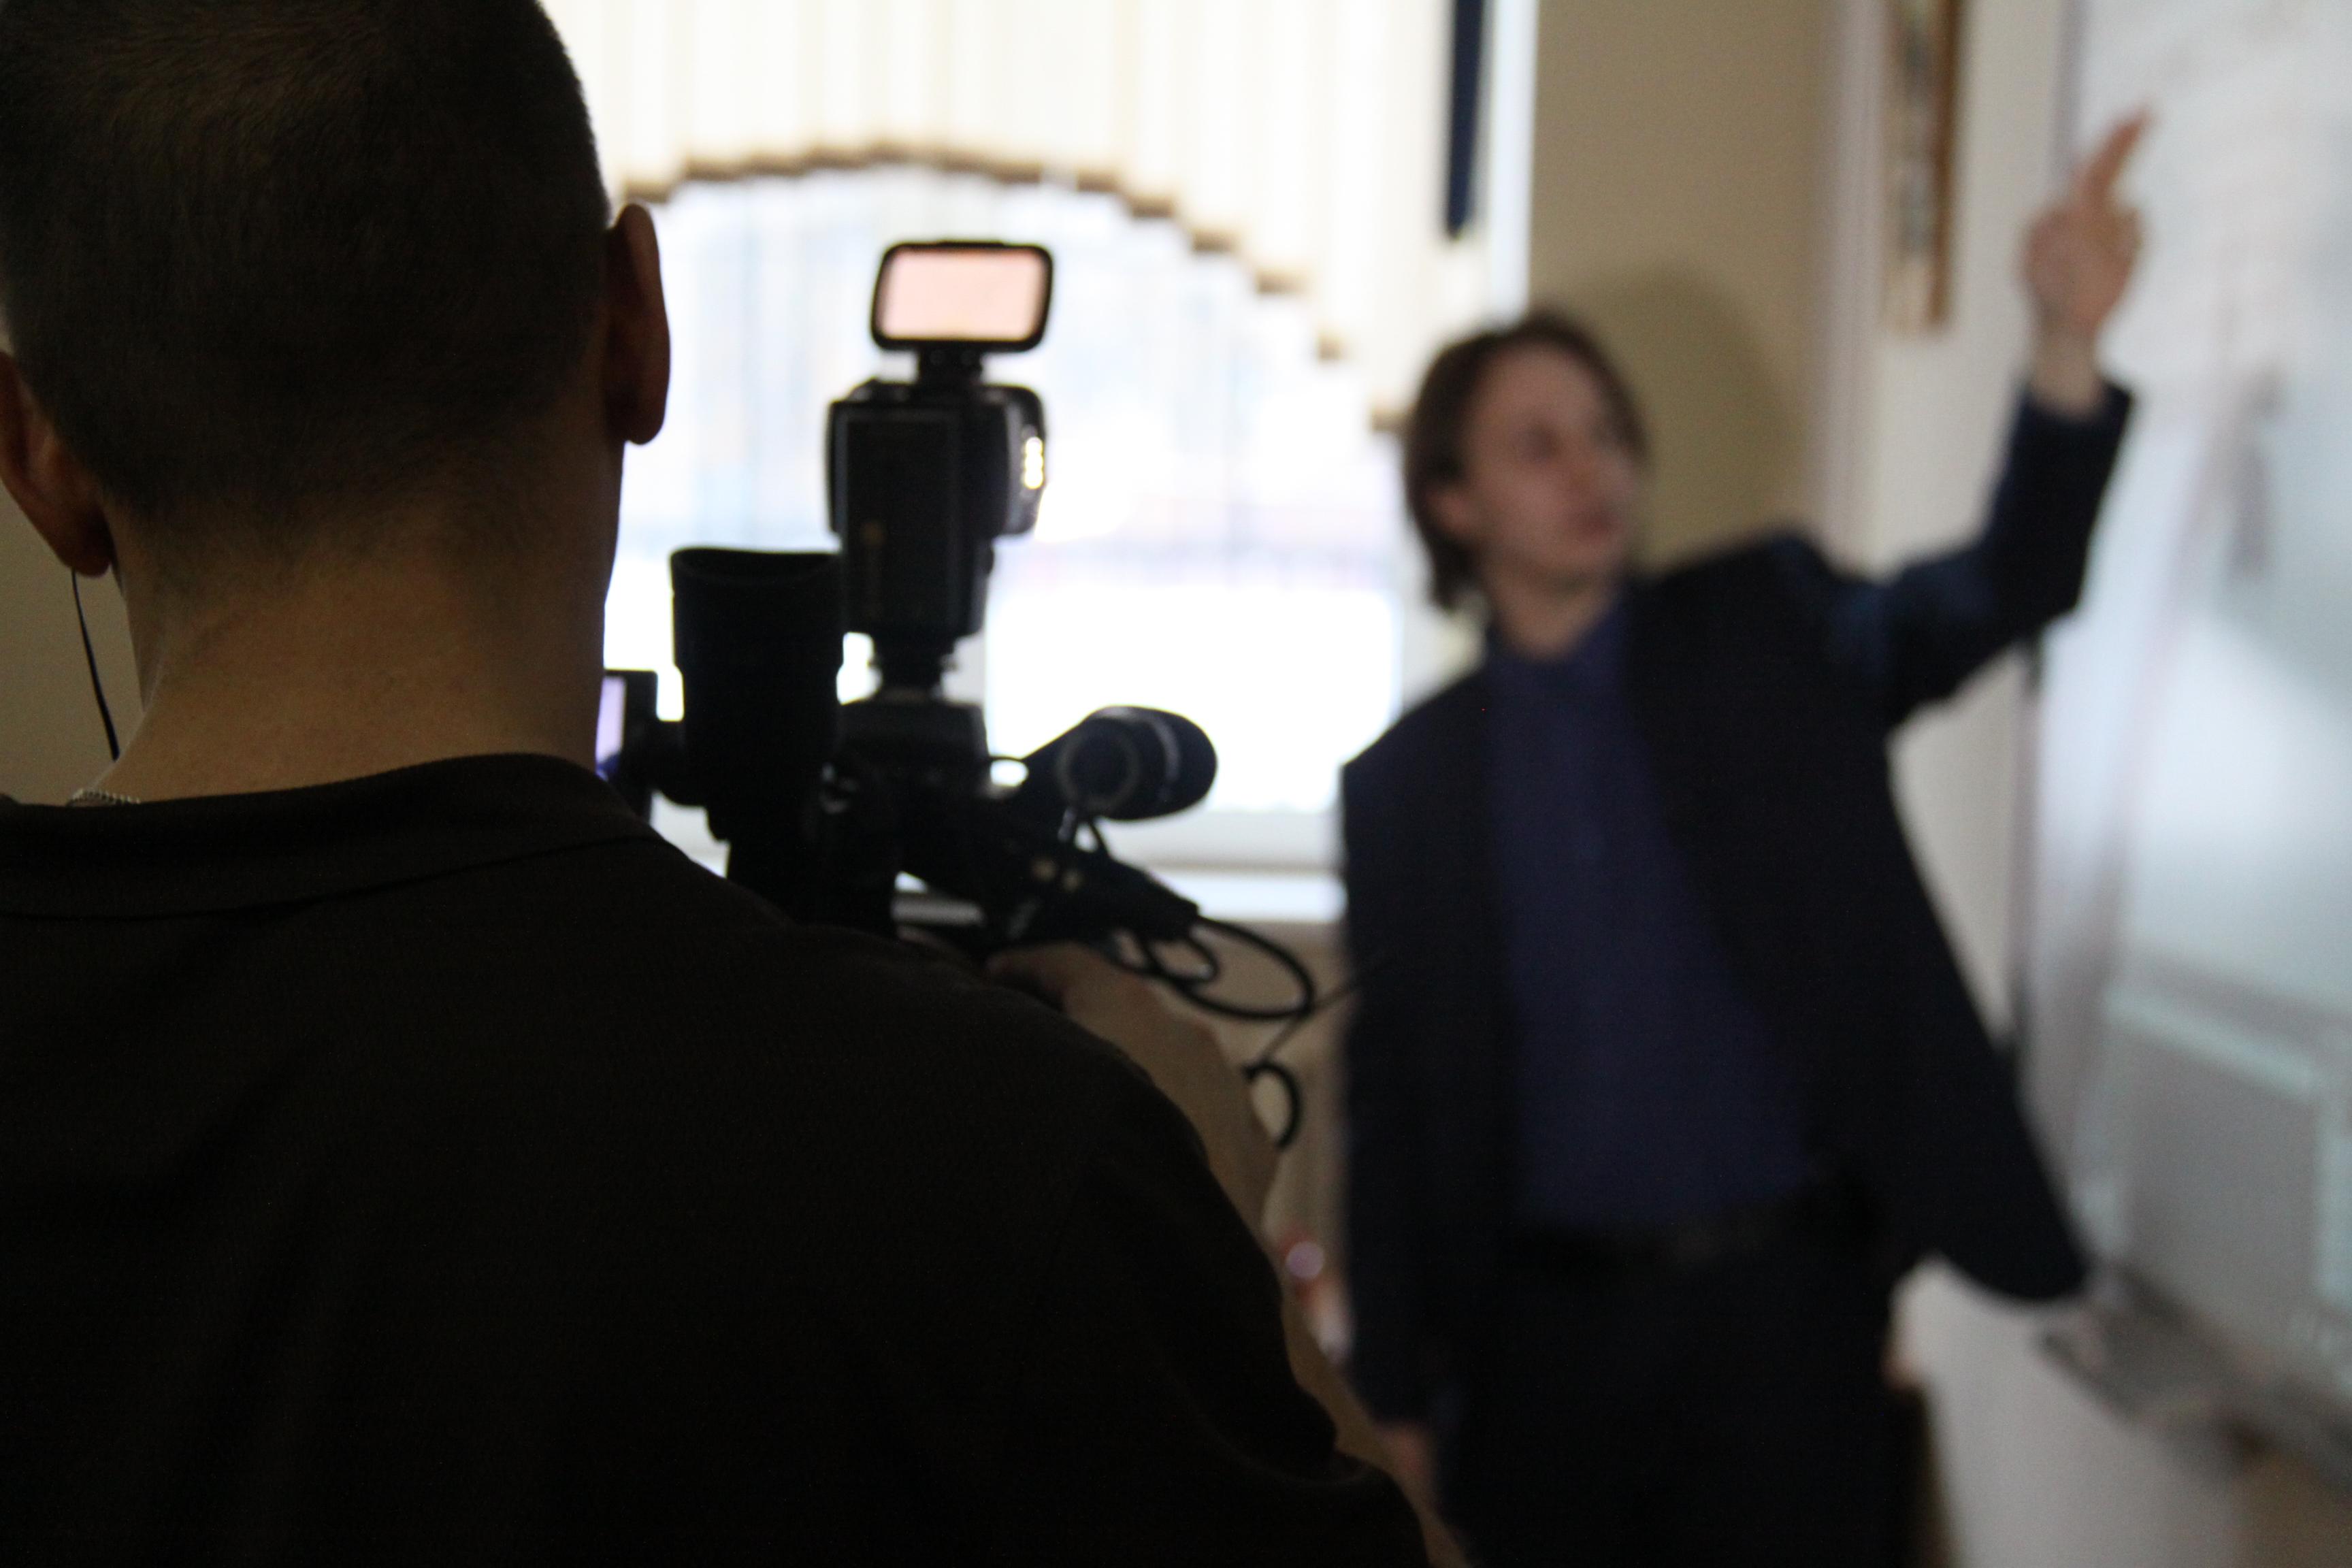 02.02.2019 #КлассИКИ: Мастер-класс Валерия Малащенко